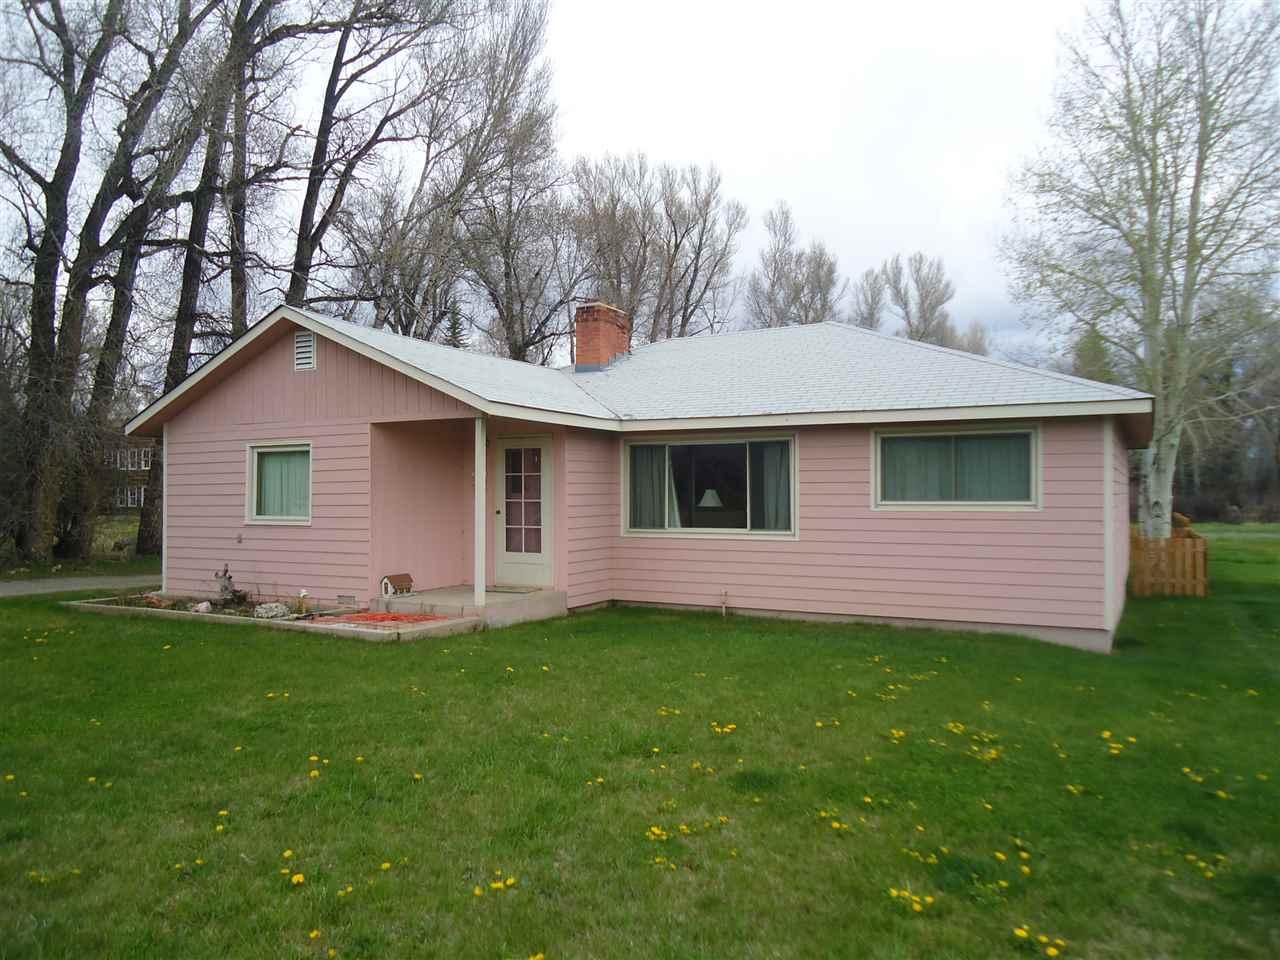 1511 W Tomichi Ave, Gunnison, CO 81230